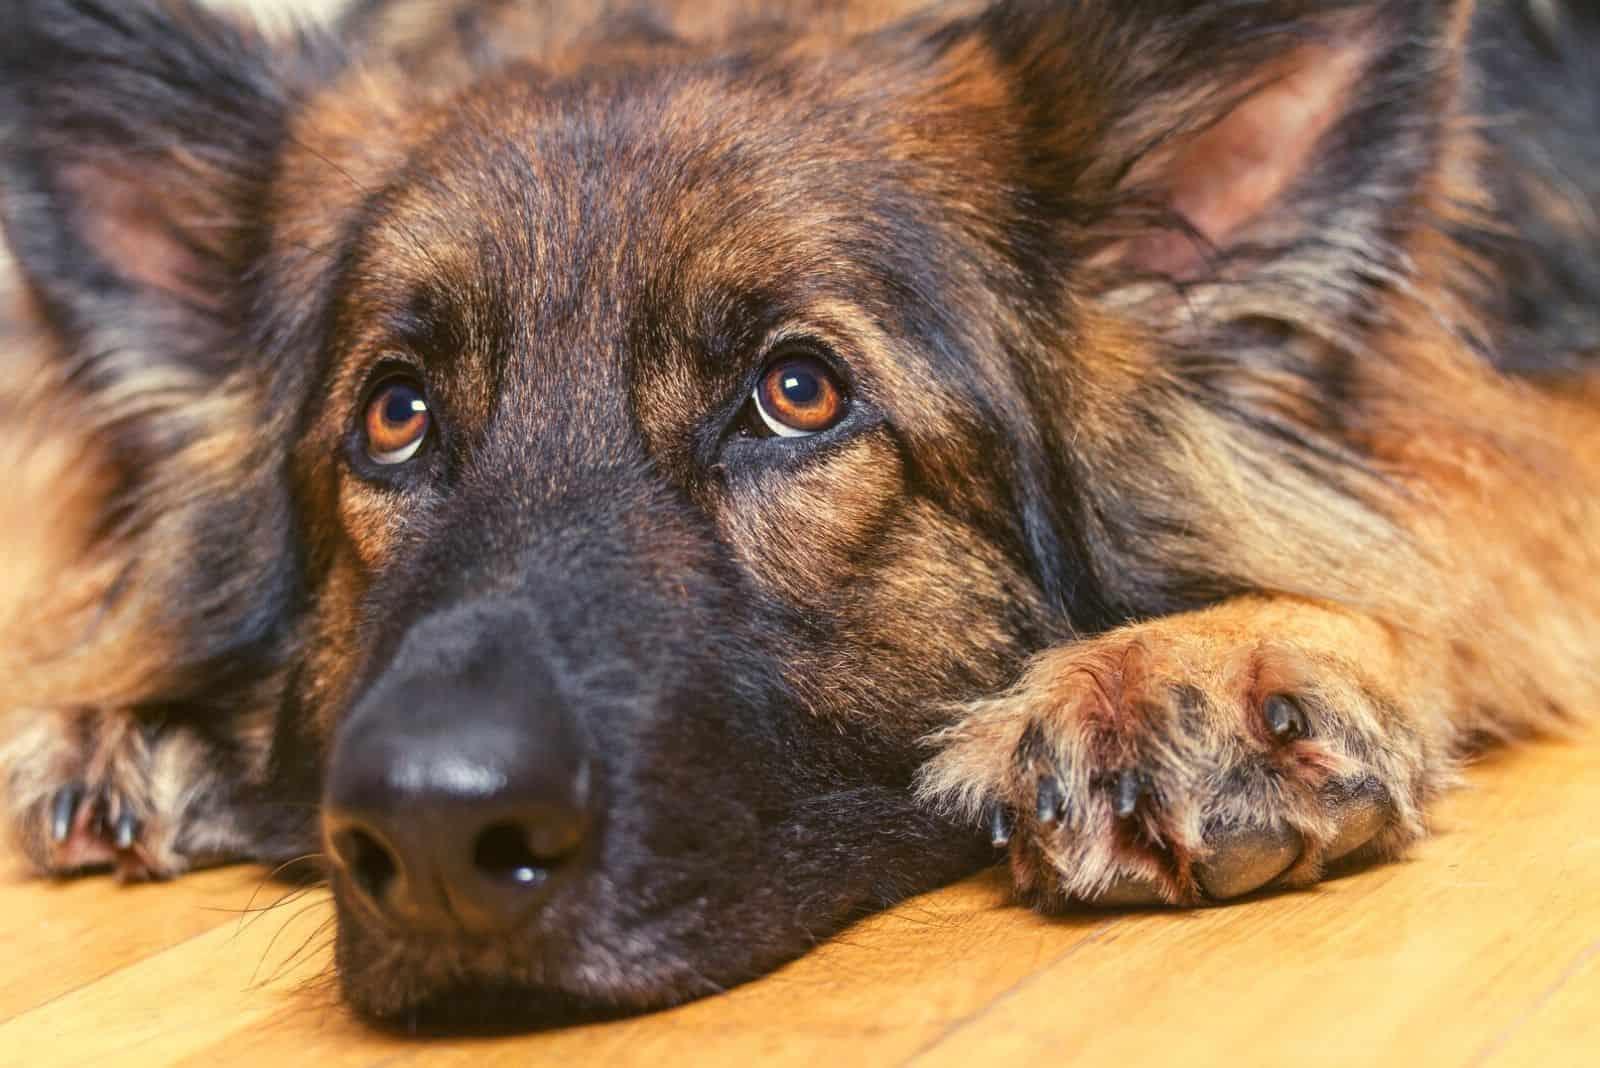 German Shepherd resting its head on a wooden floor inside looking up.